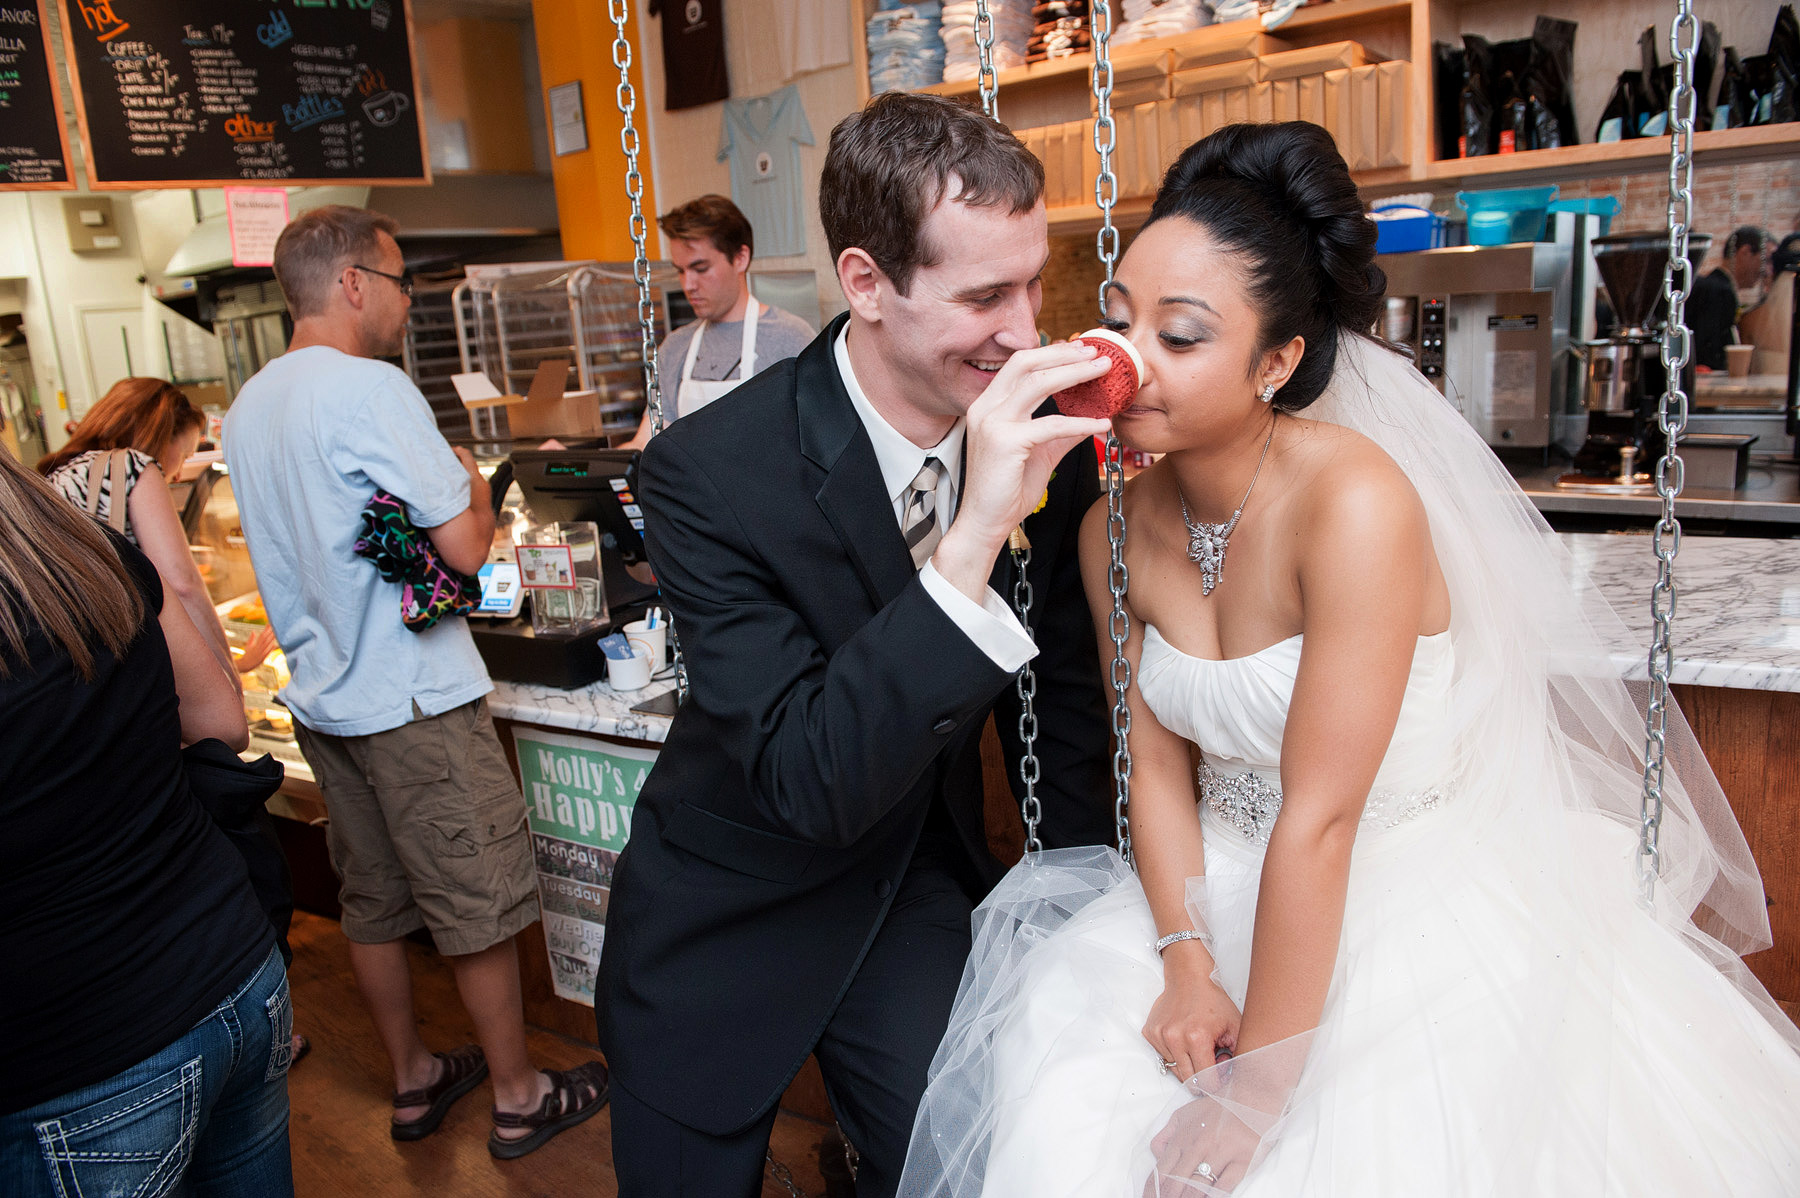 wedding-photography-saint-paul-mark-kegans-618.jpg